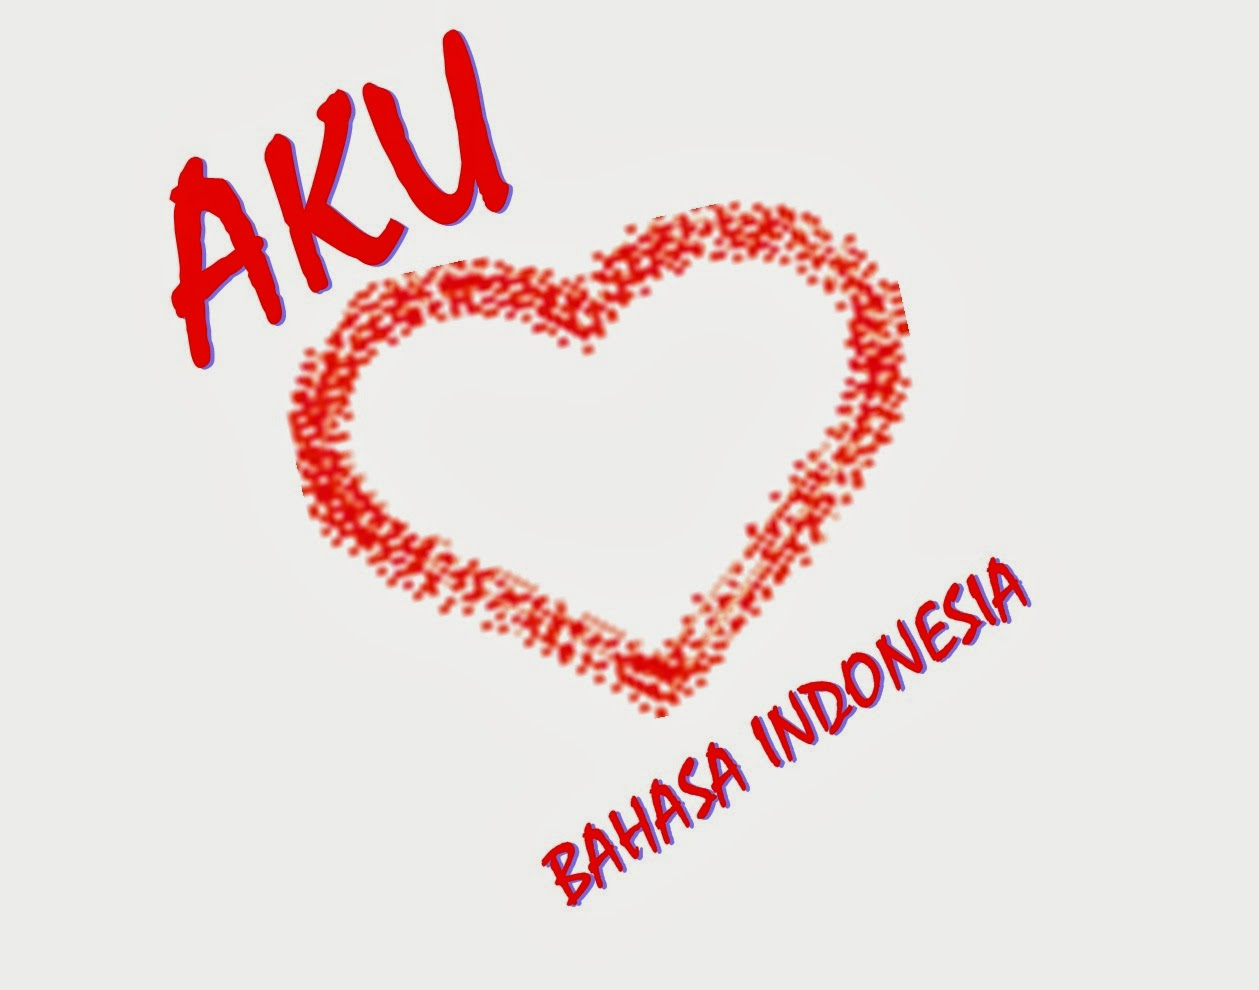 Pengantar Pelajaran Bahasa Indonesia [Bacaan Lengkap]